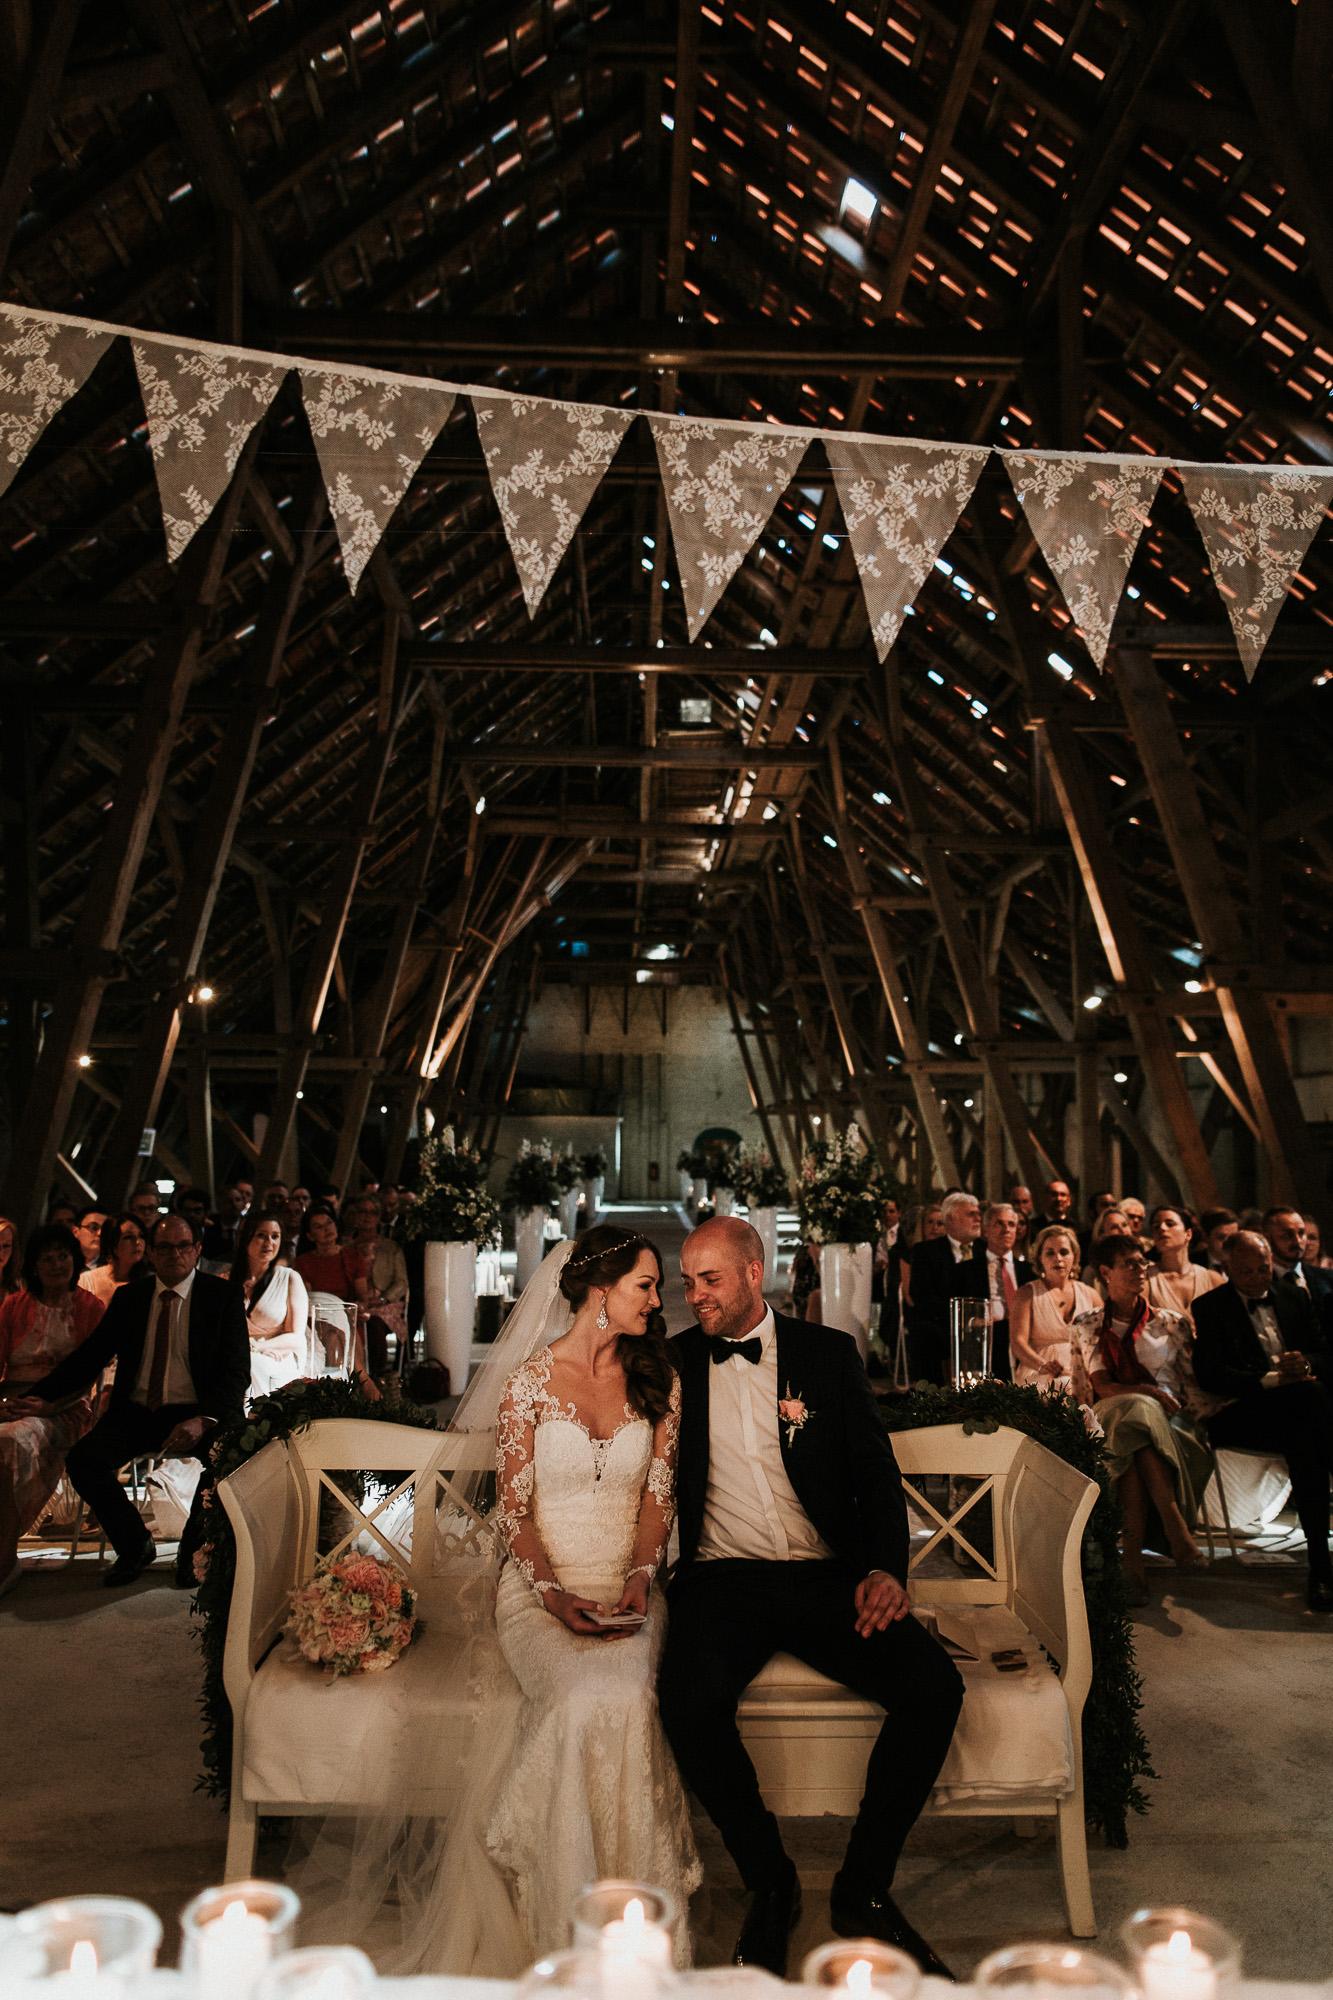 DanielaMarquardtPhotography_Hochzeitsfotograf_Düsseldorf_Köln_Mallorca_Bayern_Austria_Harz_Wedding_AileenundLennart_Weddingphotographer_Ibiza_Tuskany_Italien_Toskana_Portugal_Lissabon138